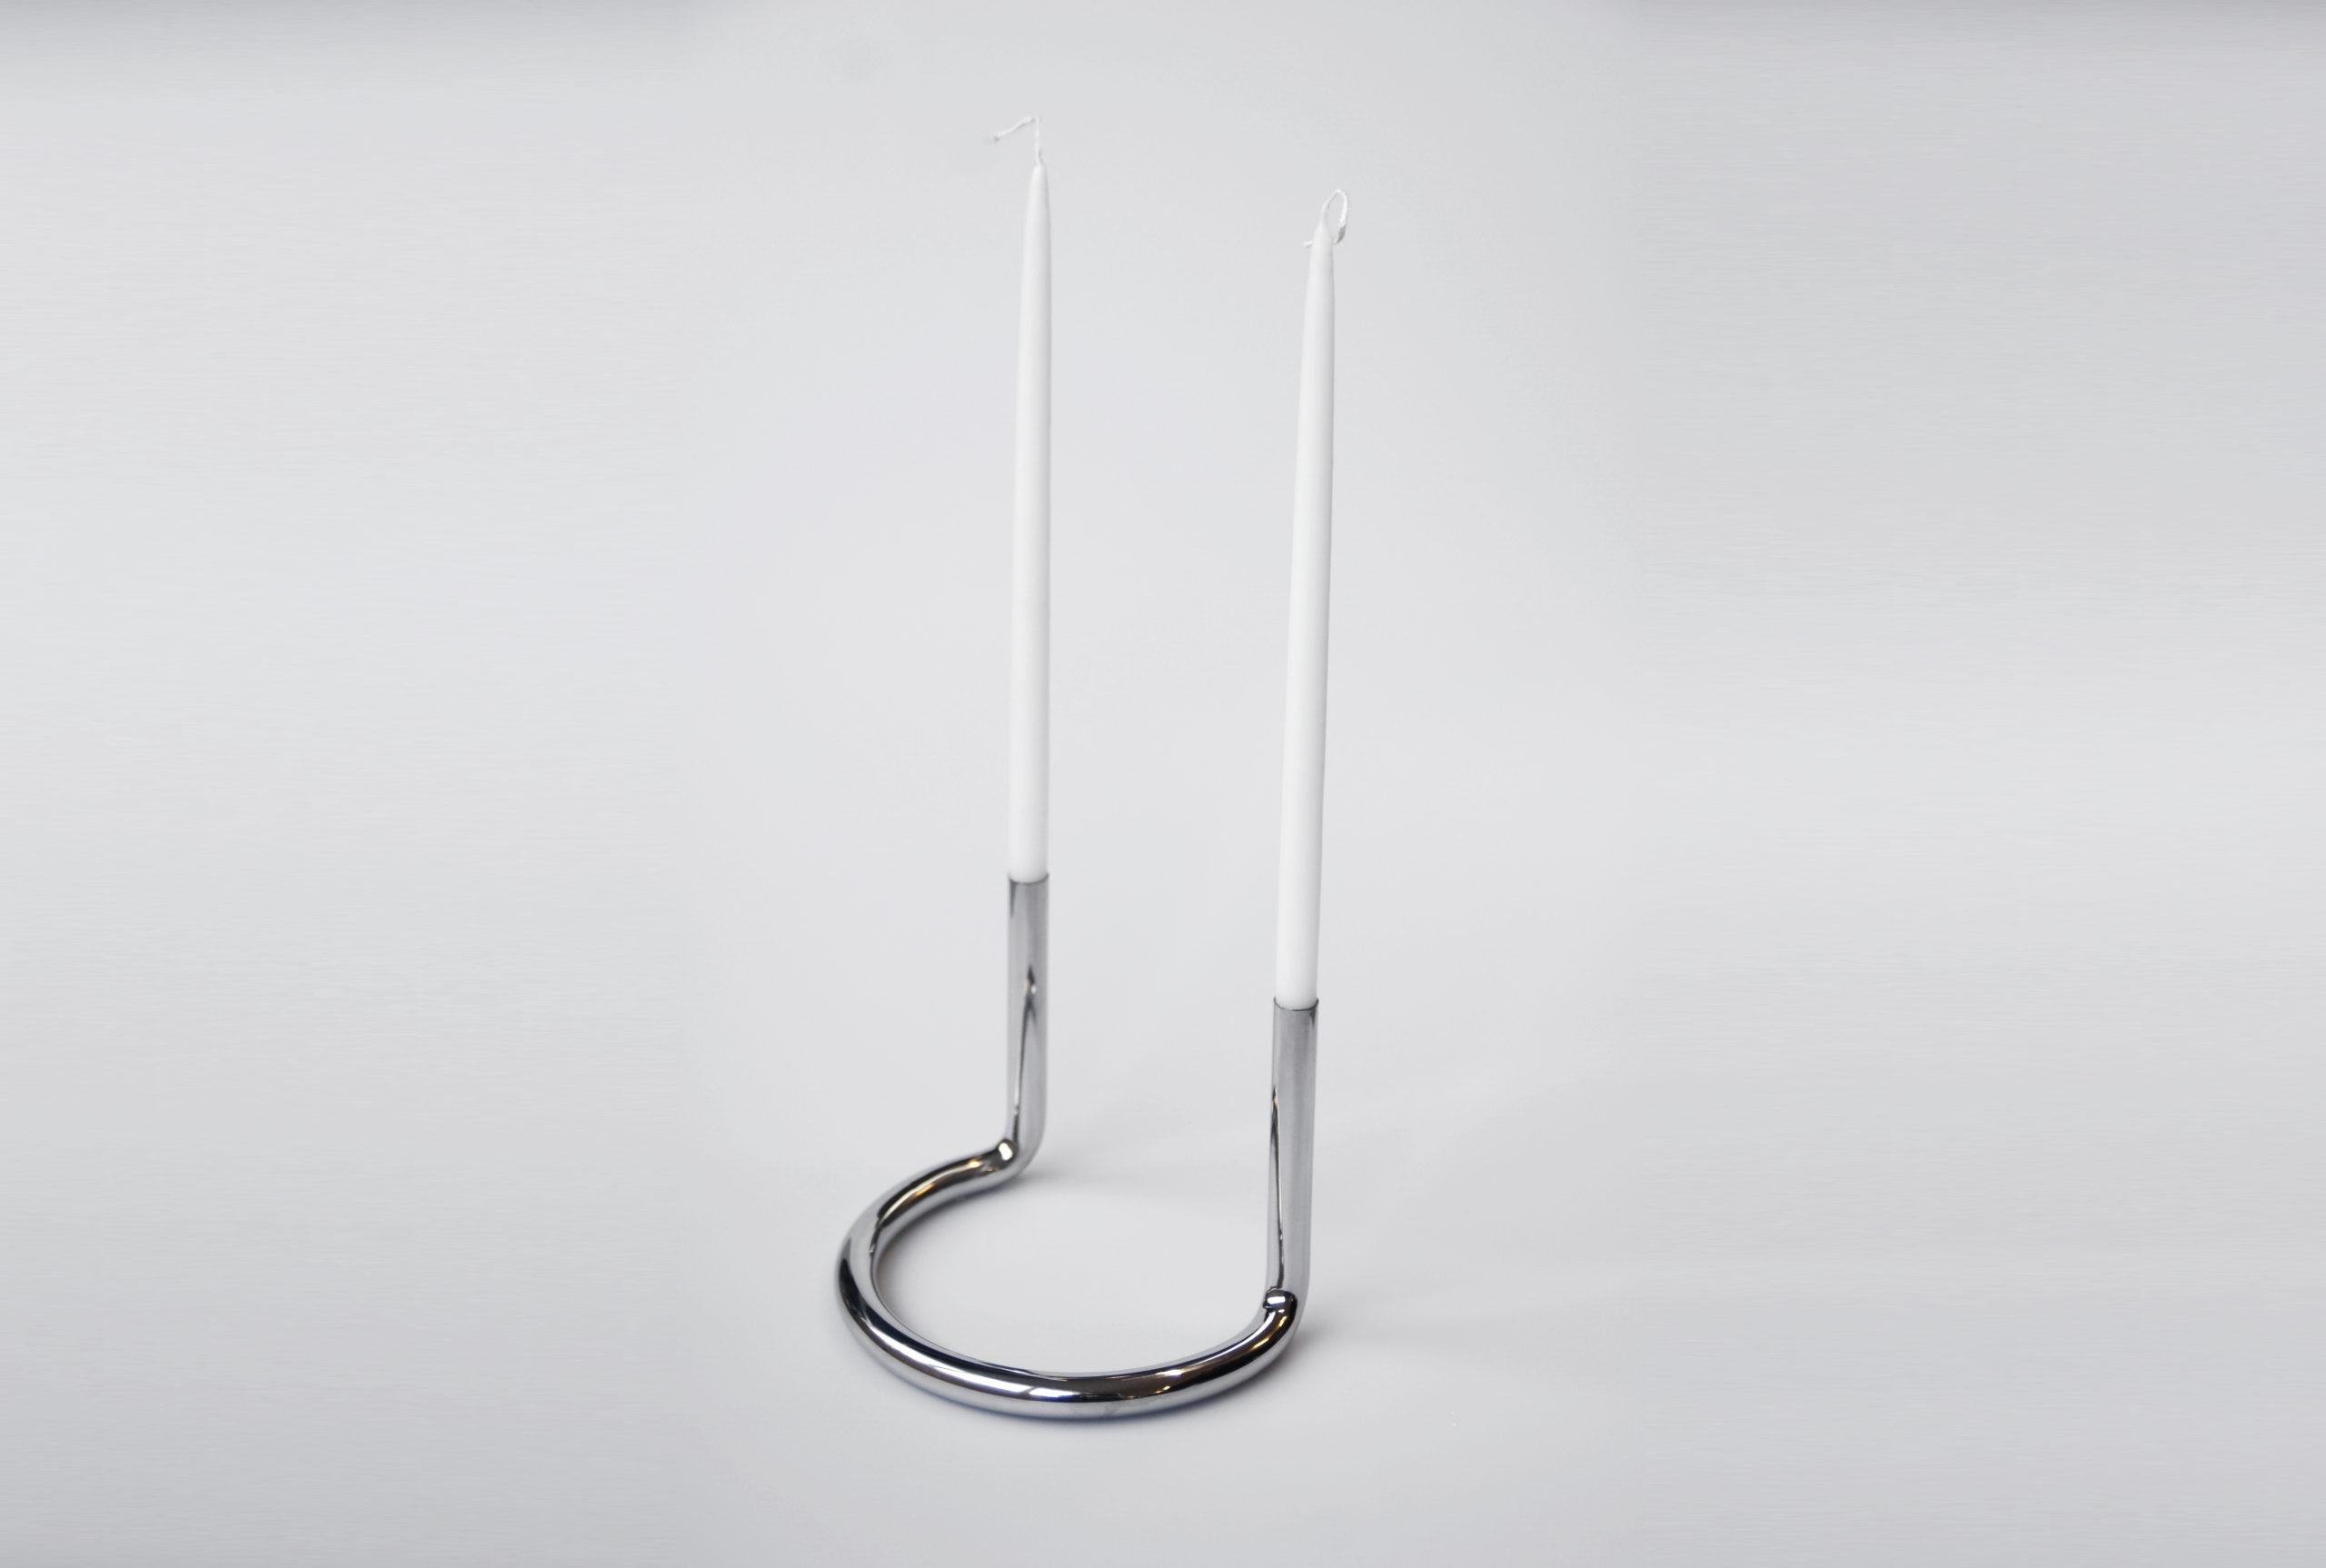 Architectmade-Gemini-Polished-Stainless-Steel-Candleholder-Peter-Karpf-7